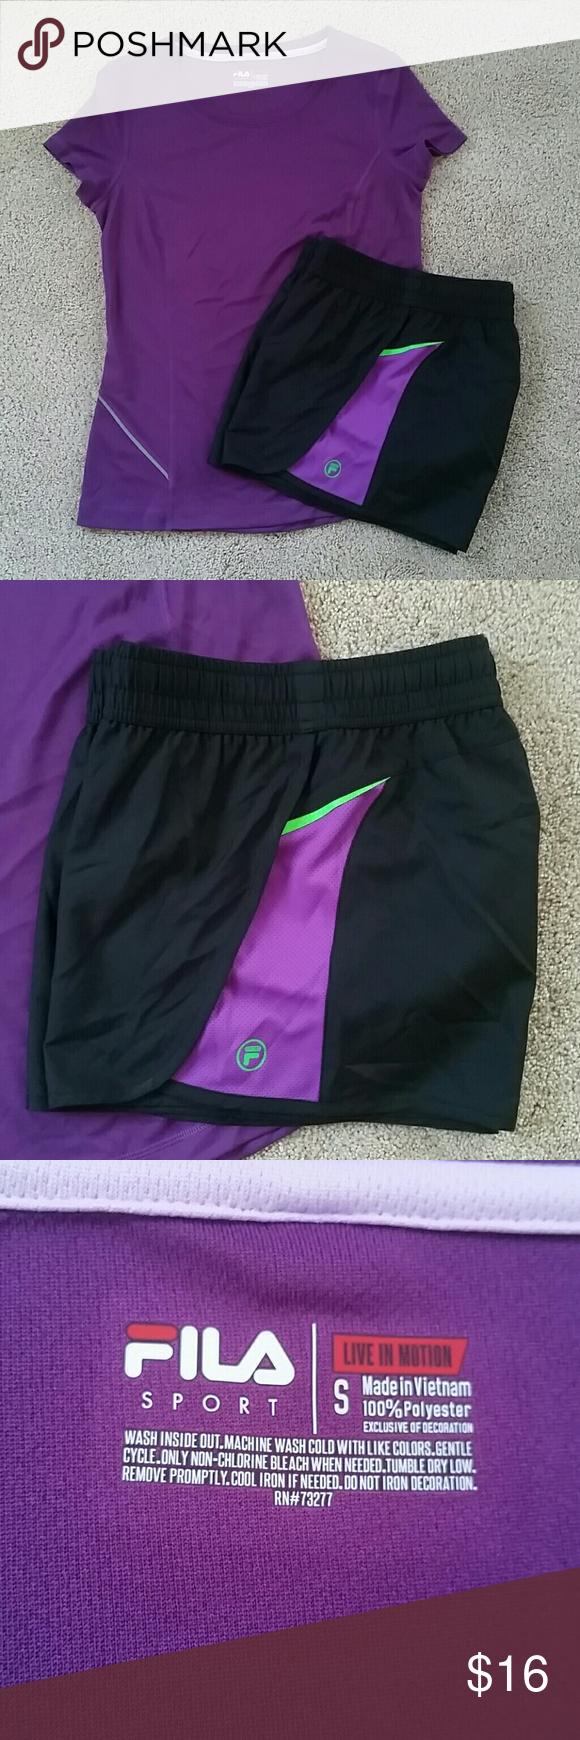 32ee161de7a NWOT Fila Sport Outfit NWOT Both size small. Top: Purple Fila scoop neck  performance